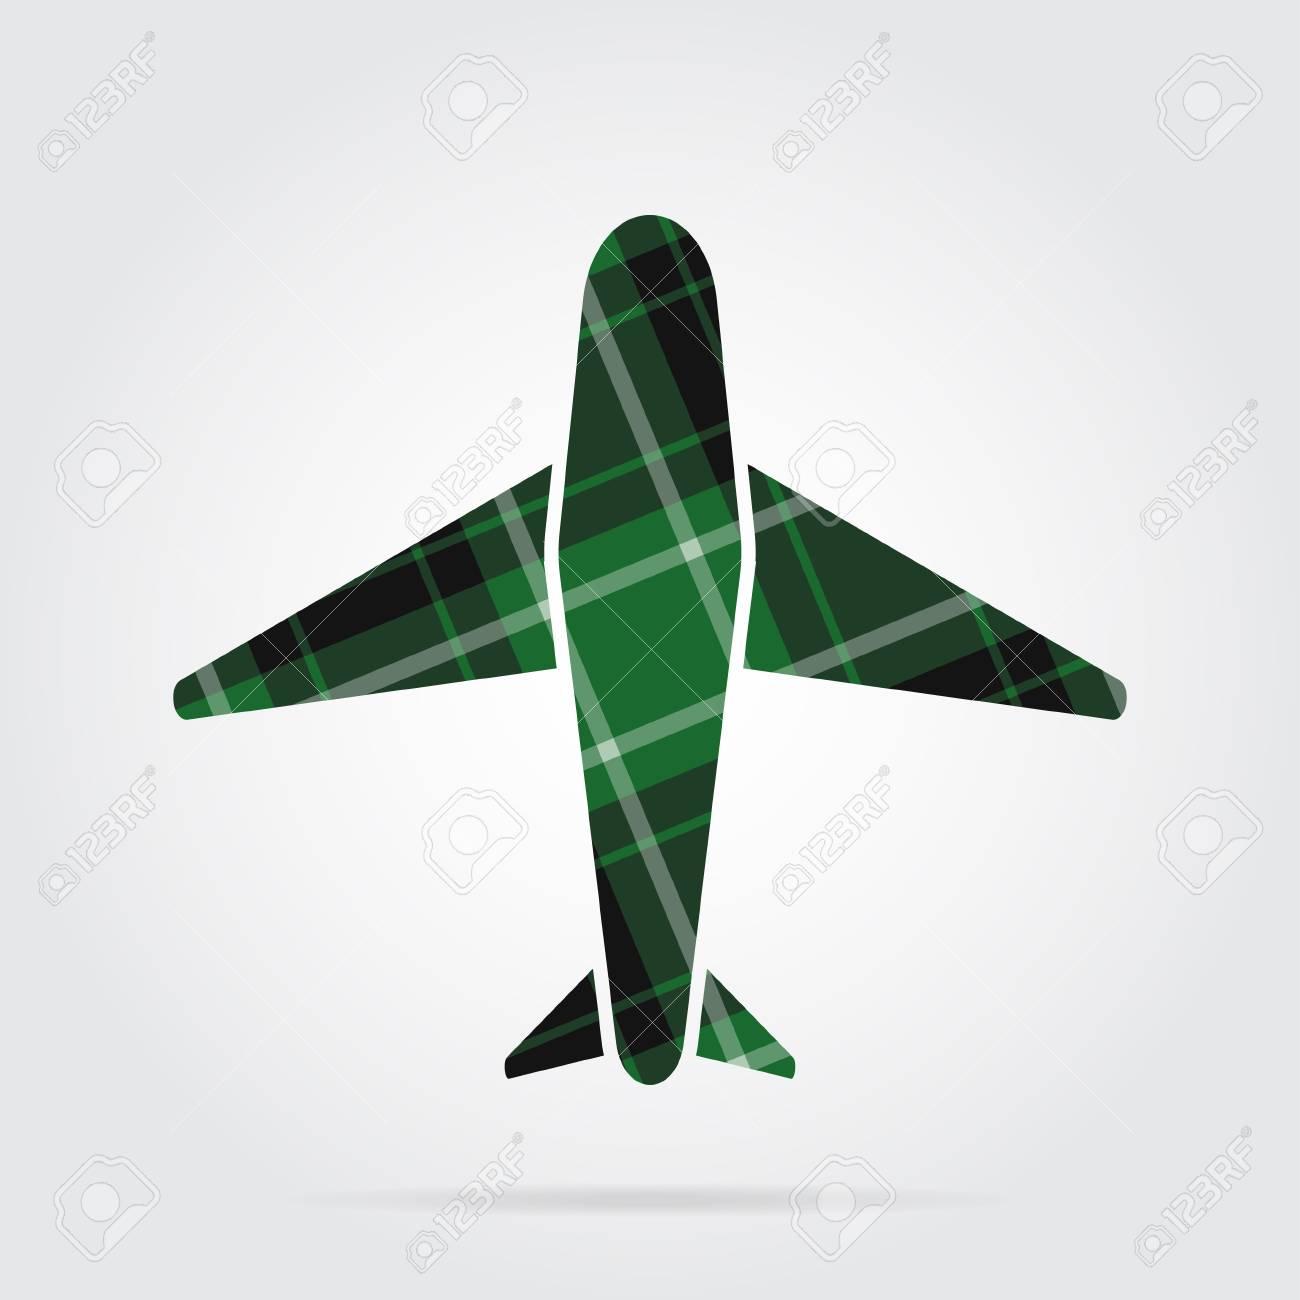 green, black isolated tartan icon with white stripes.